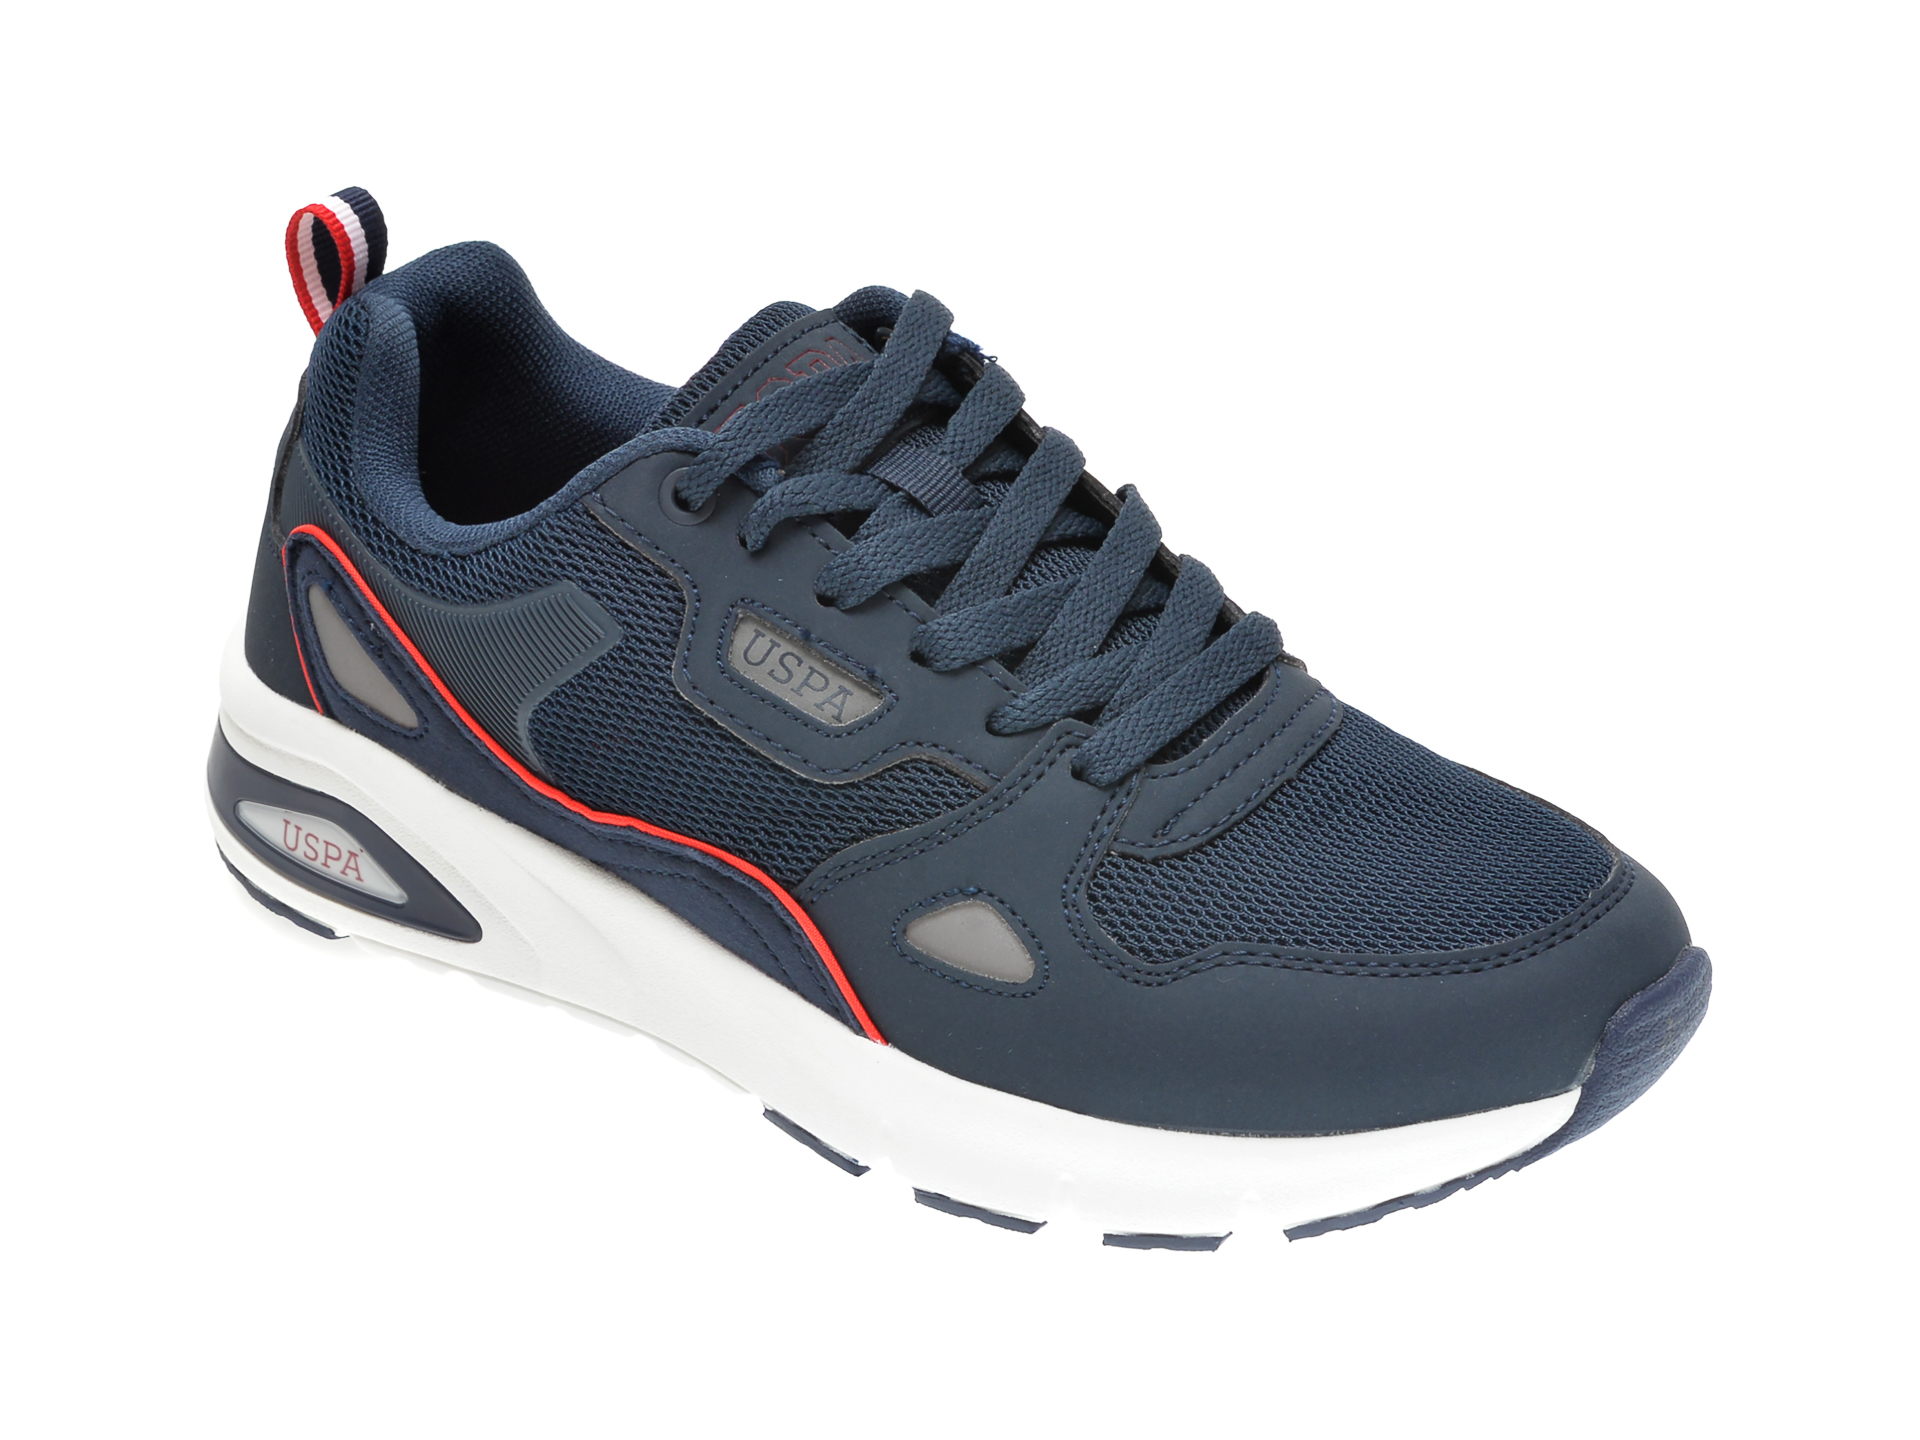 Pantofi sport US POLO ASSN bleumarin, 489901, din piele ecologica New